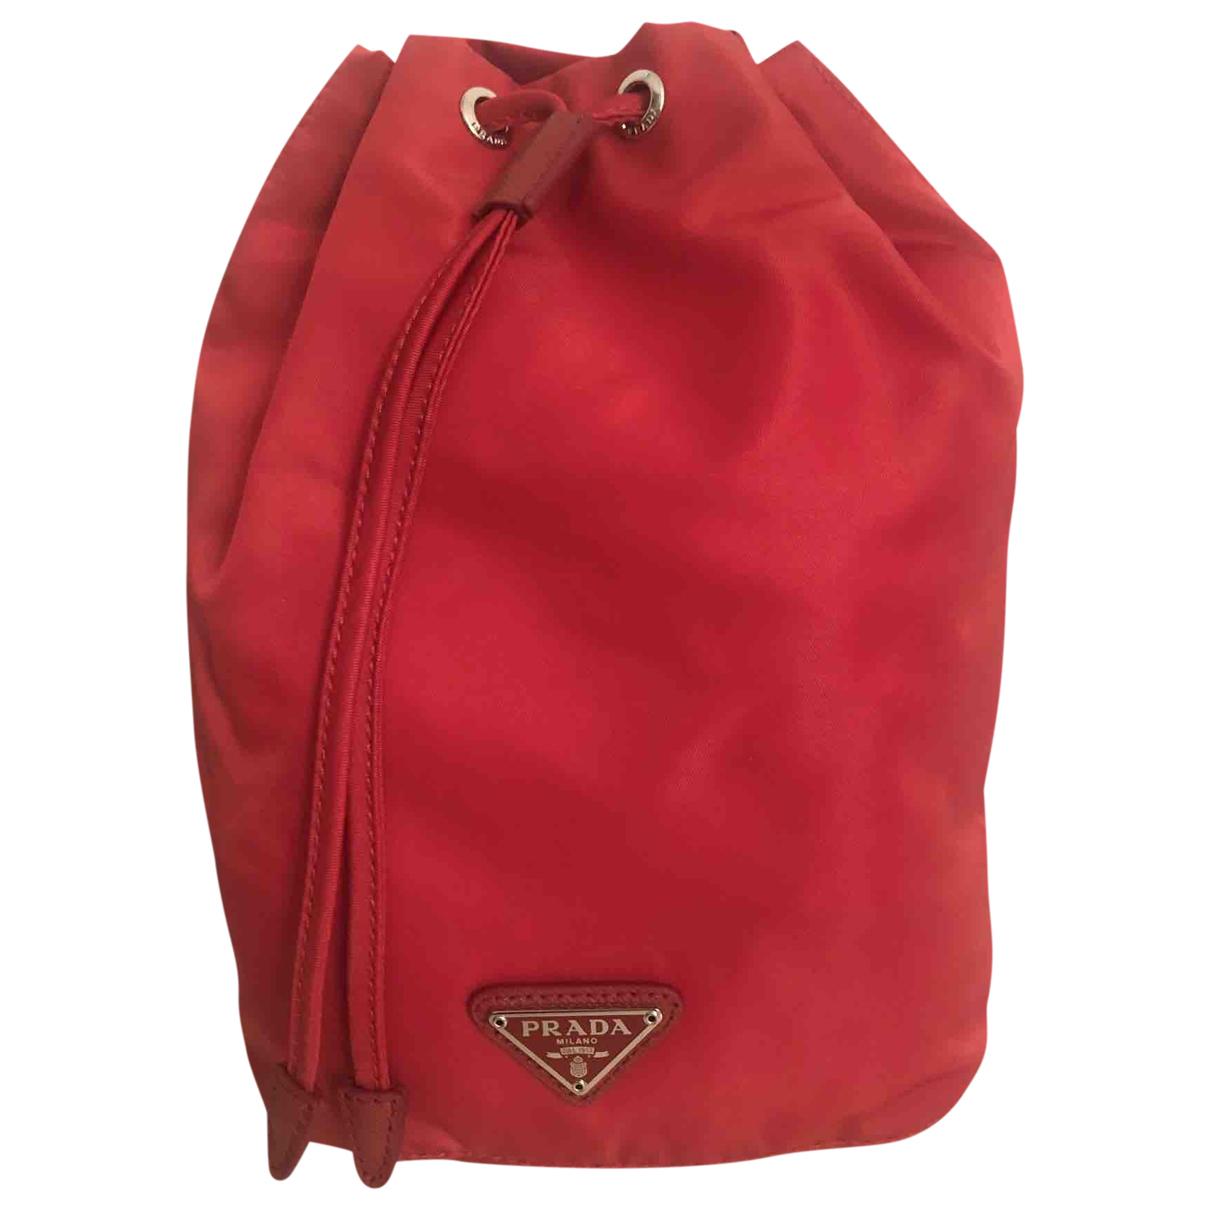 Prada \N Red handbag for Women \N